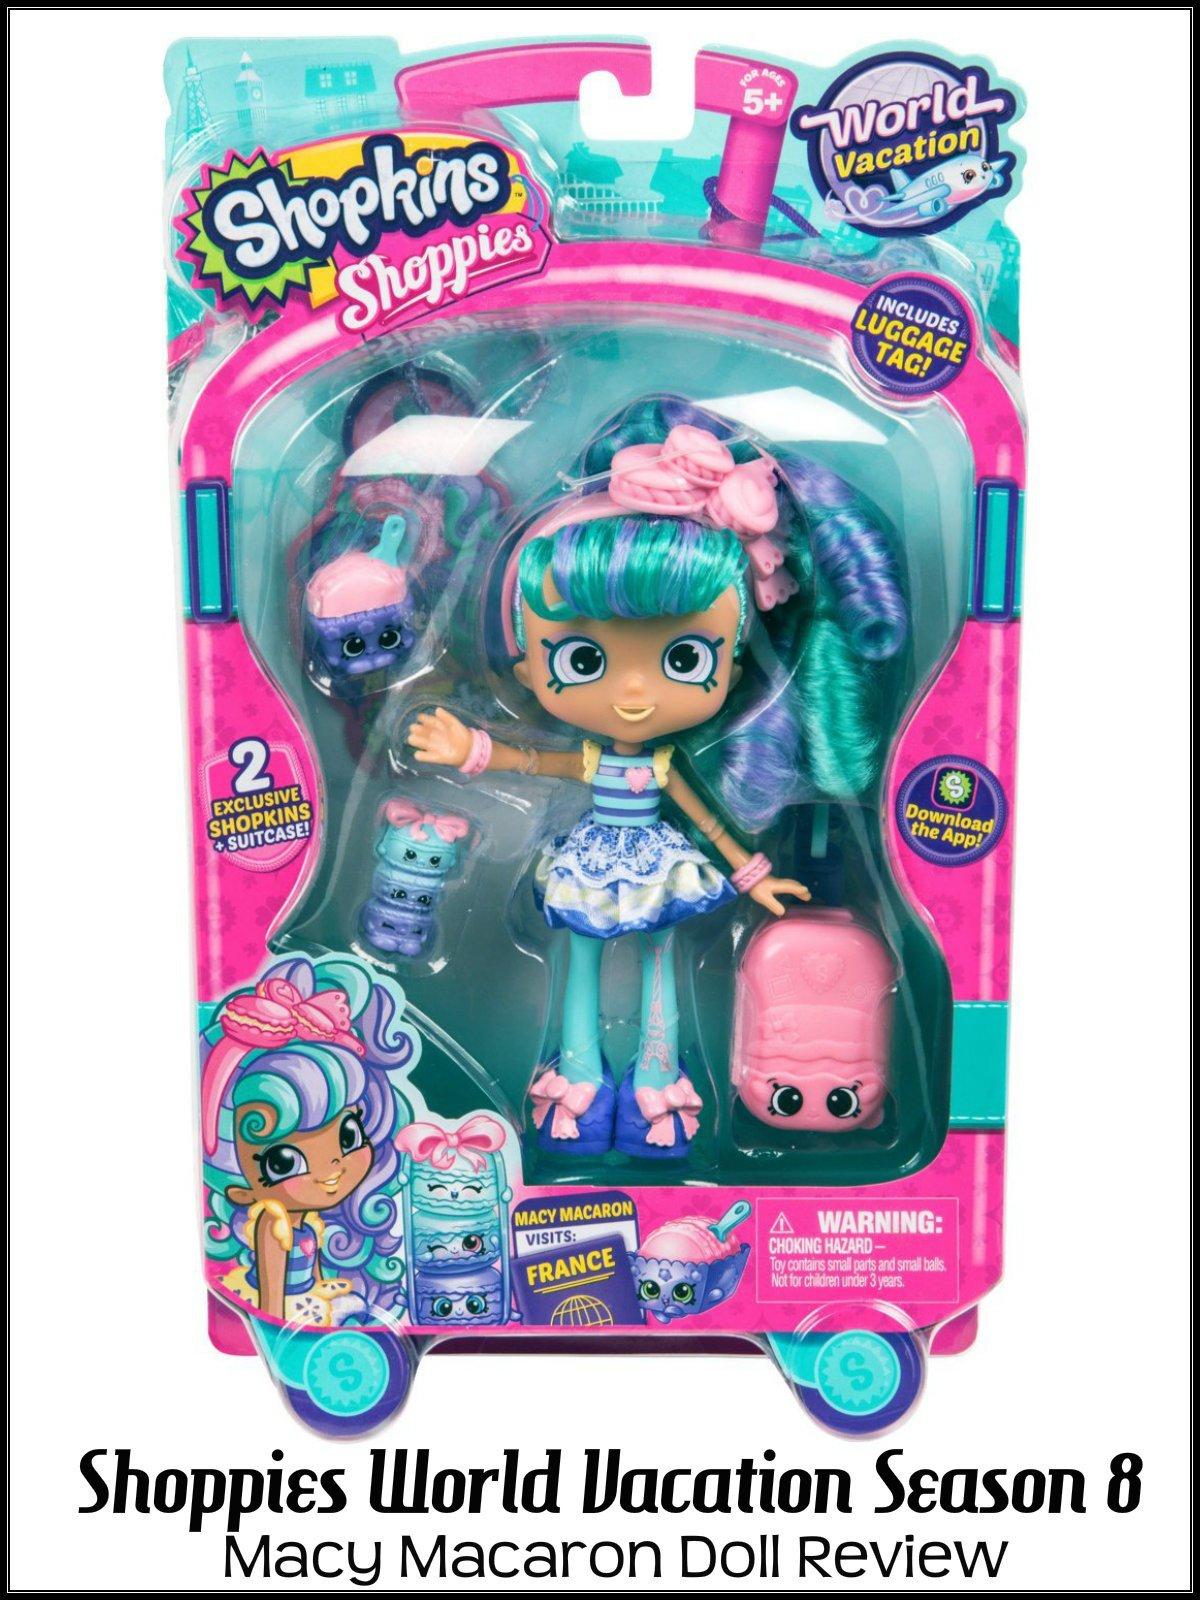 Review: Shoppies World Vacation Season 8 Macy Macaron Doll Review